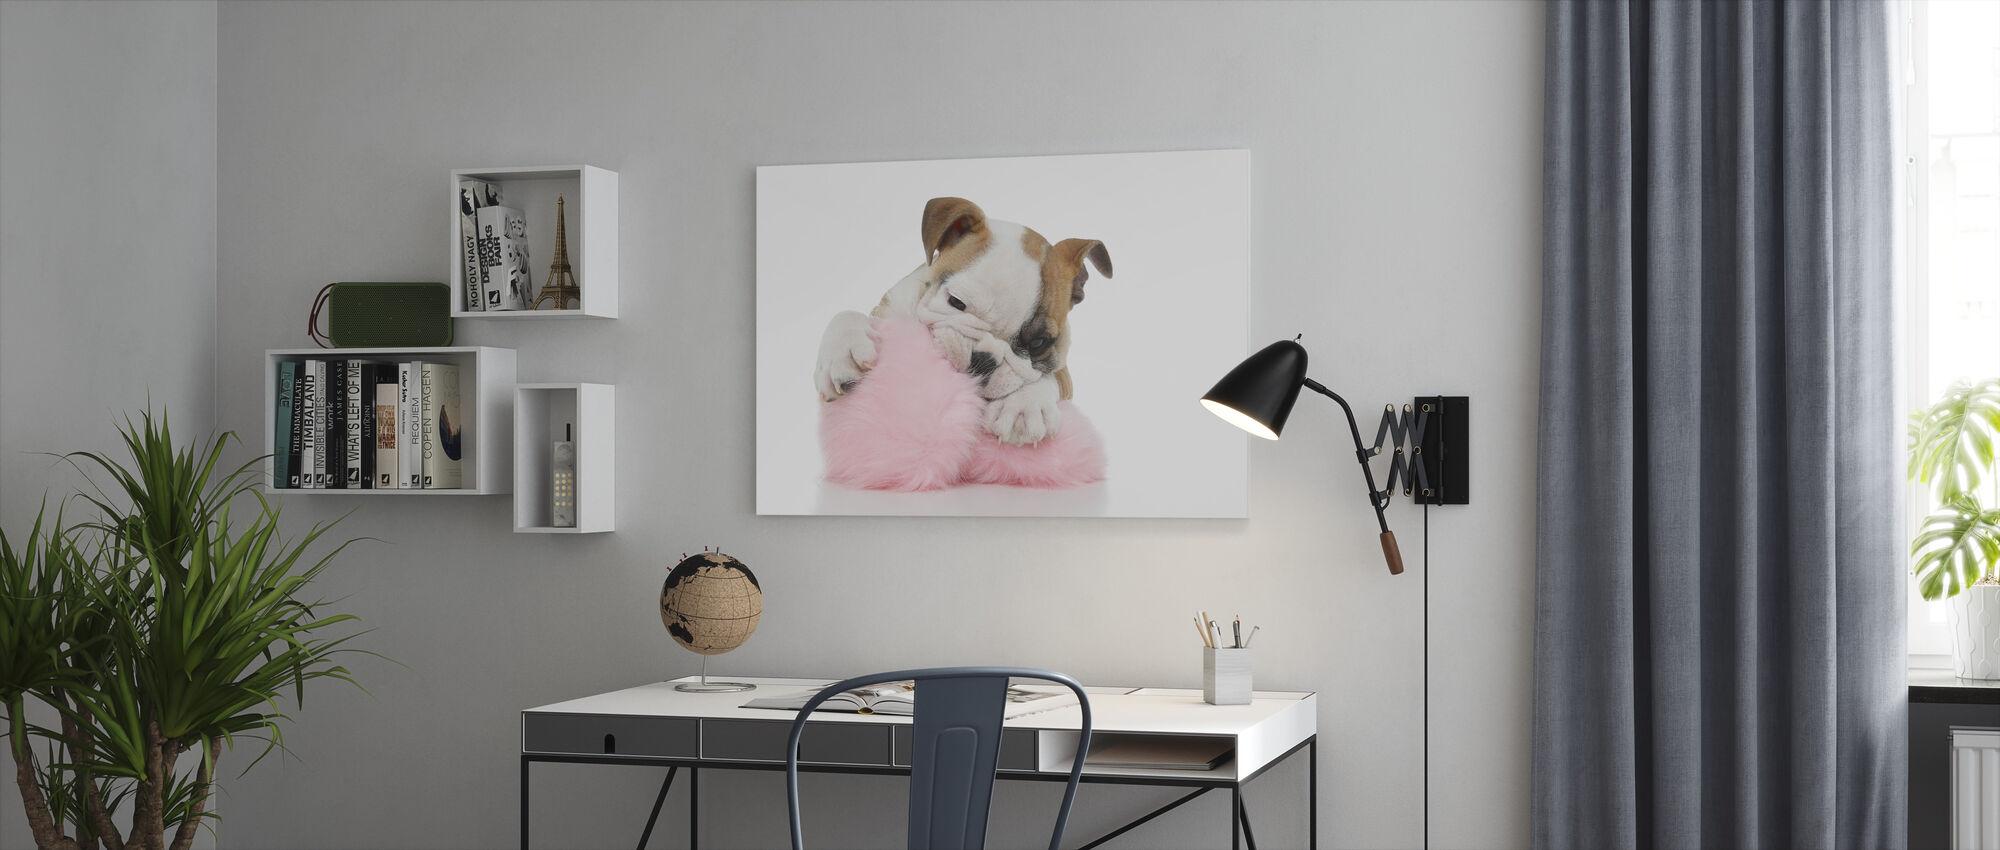 Mischievous Bulldog Puppy - Canvas print - Office